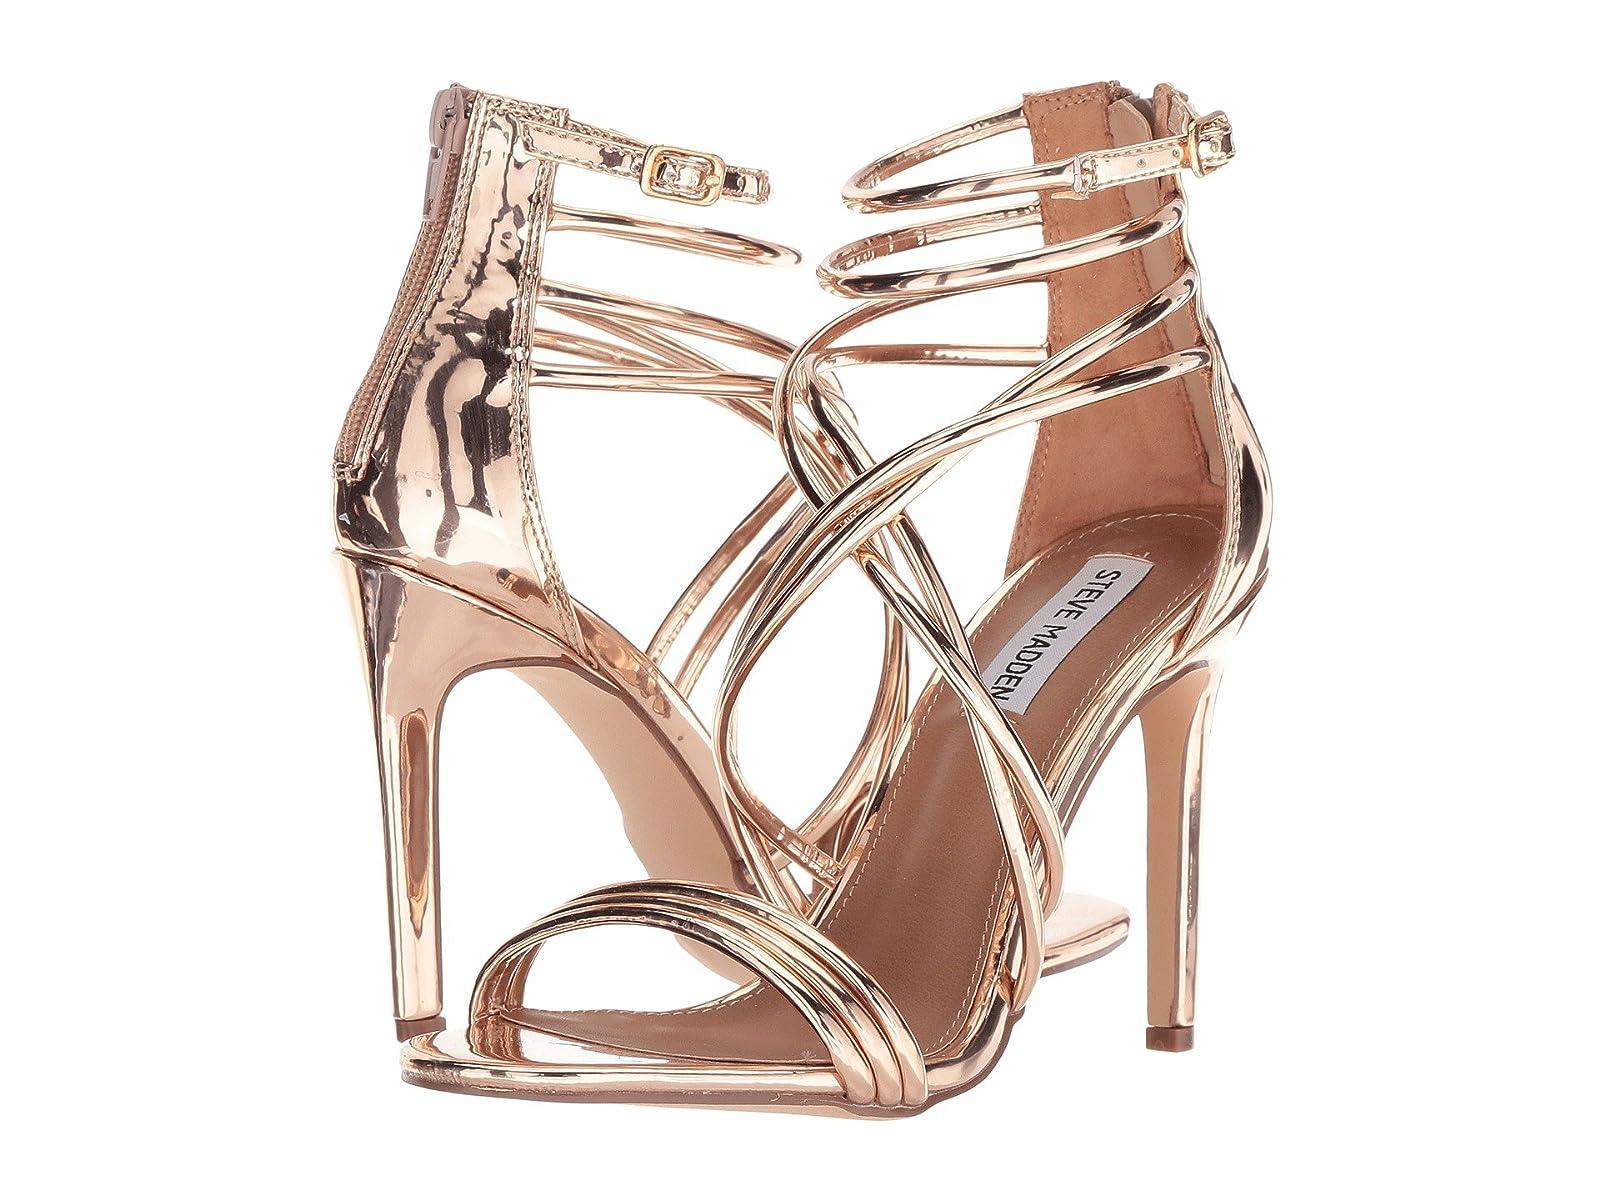 Steve Madden MartinaCheap and distinctive eye-catching shoes